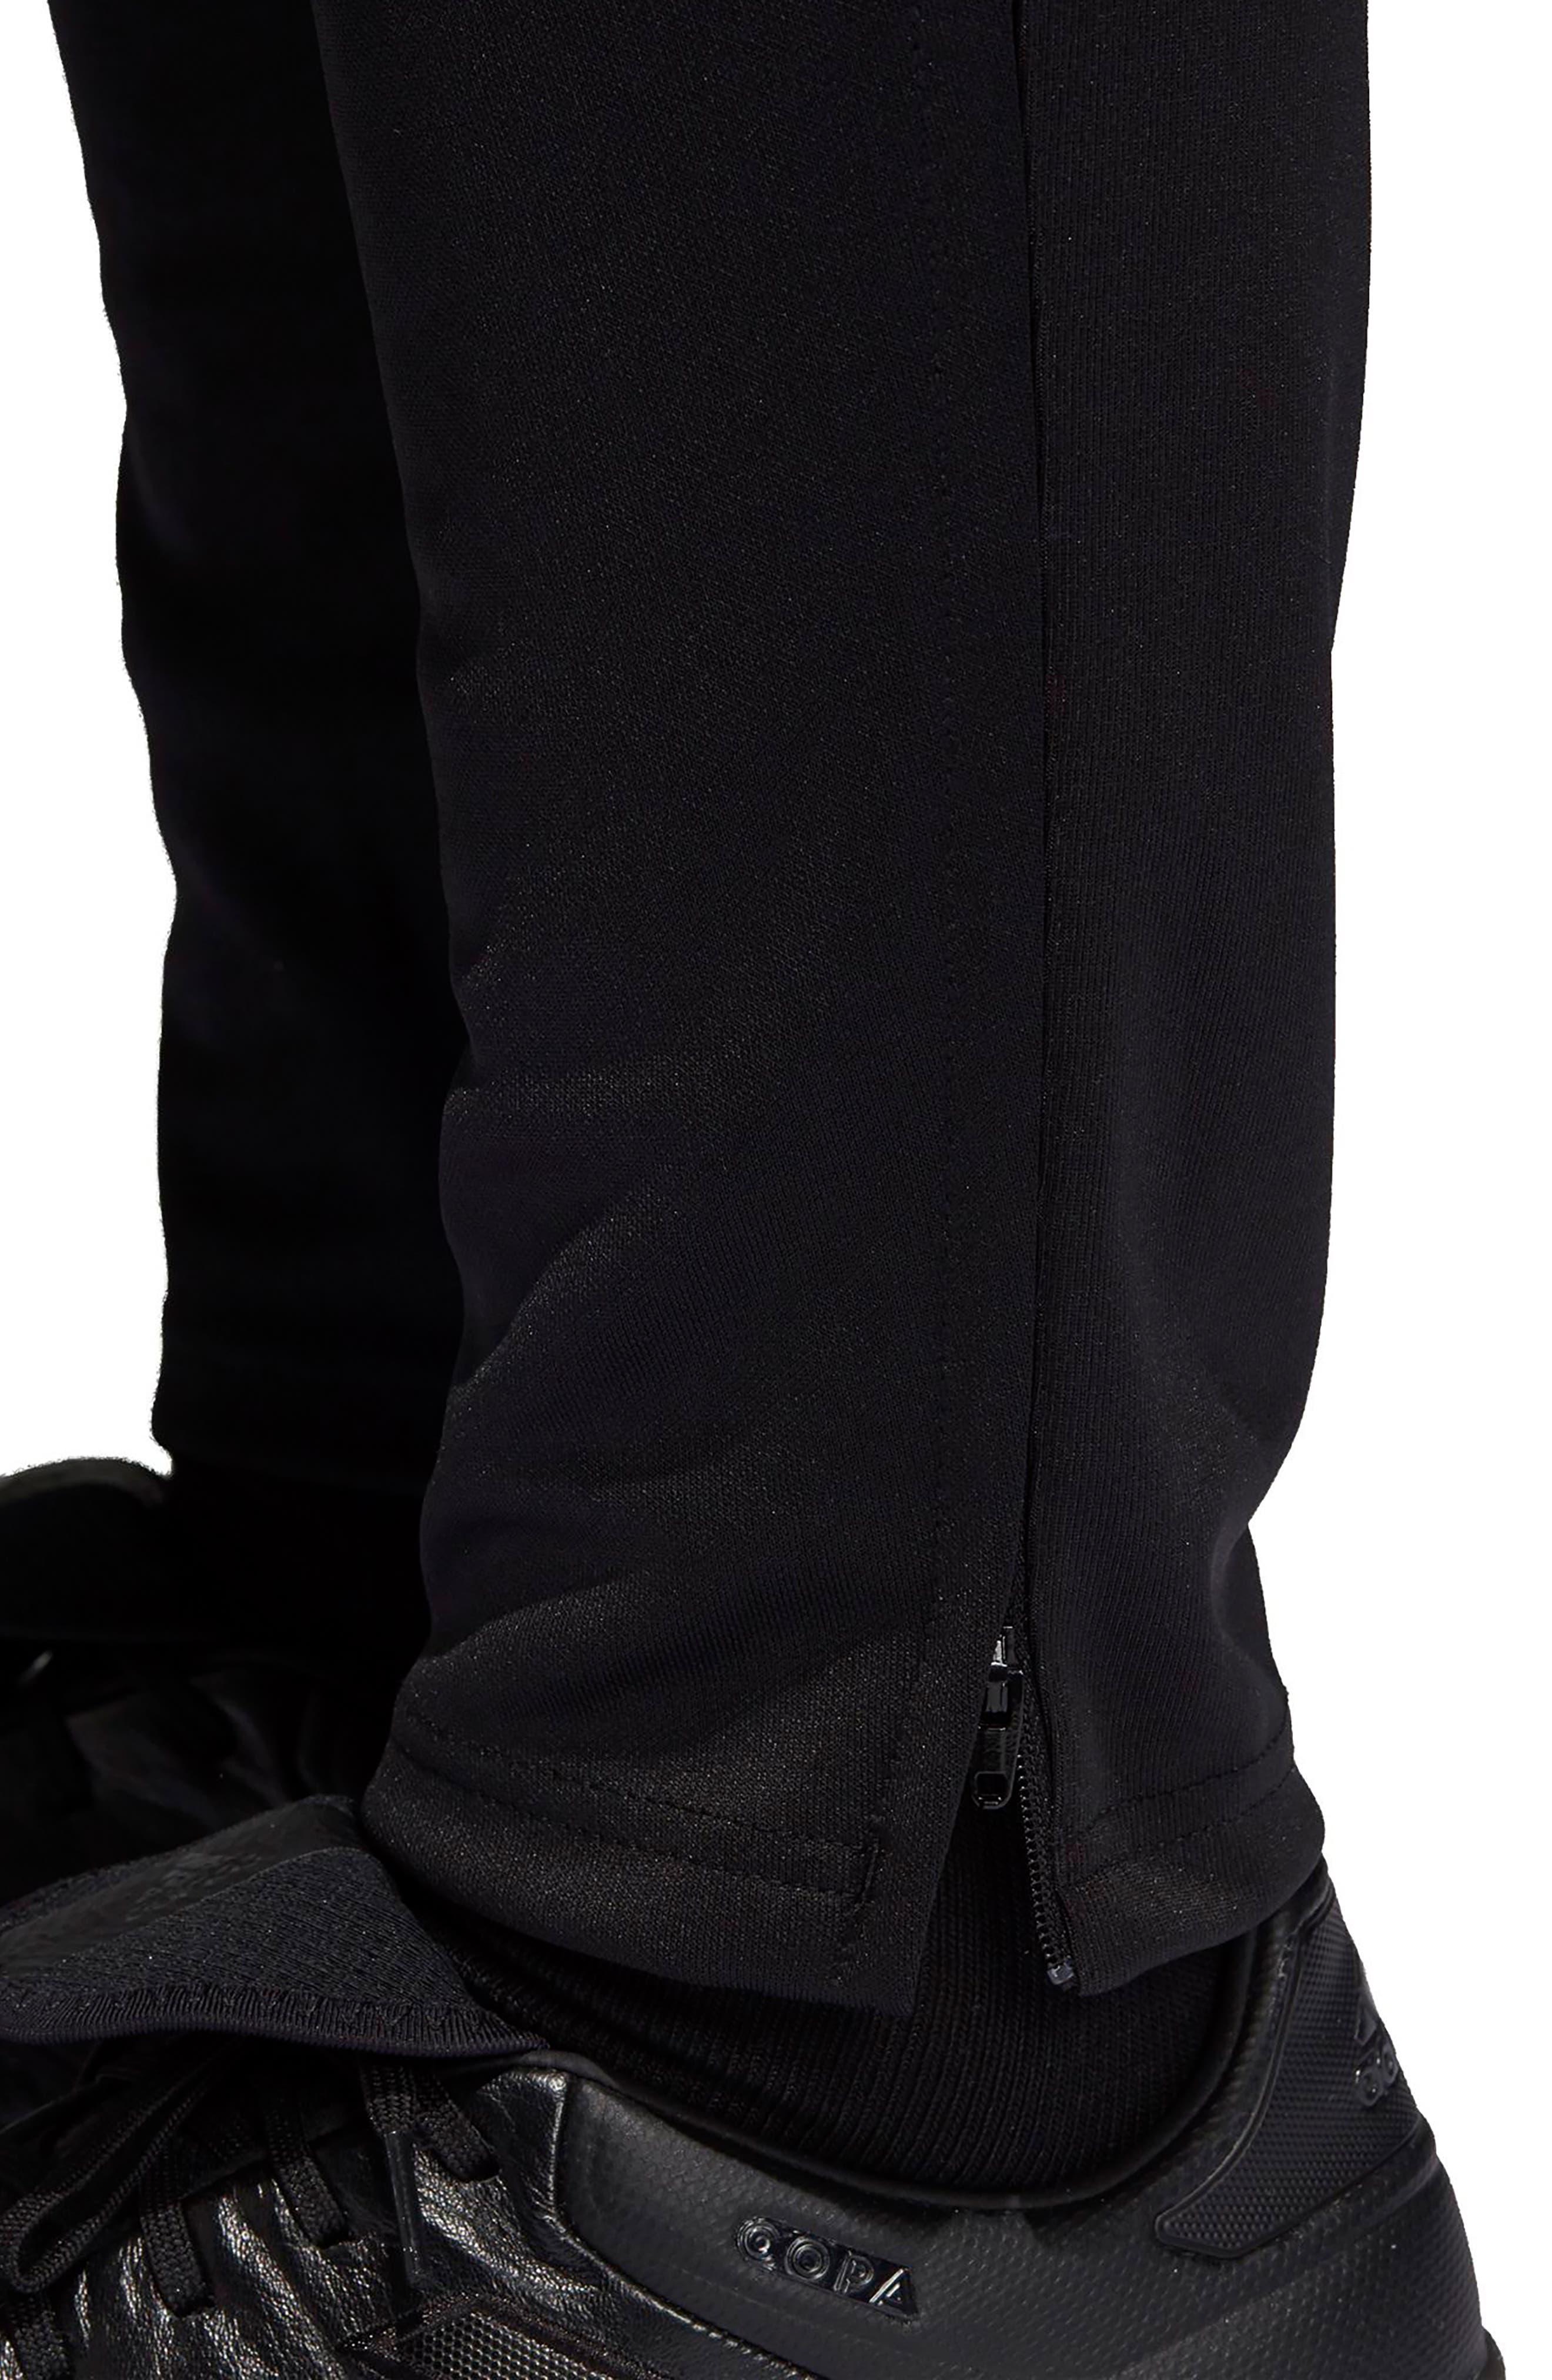 Tiro 17 Regular Fit Training Pants,                             Alternate thumbnail 6, color,                             BLACK/ RED/ WHITE/ BLUE